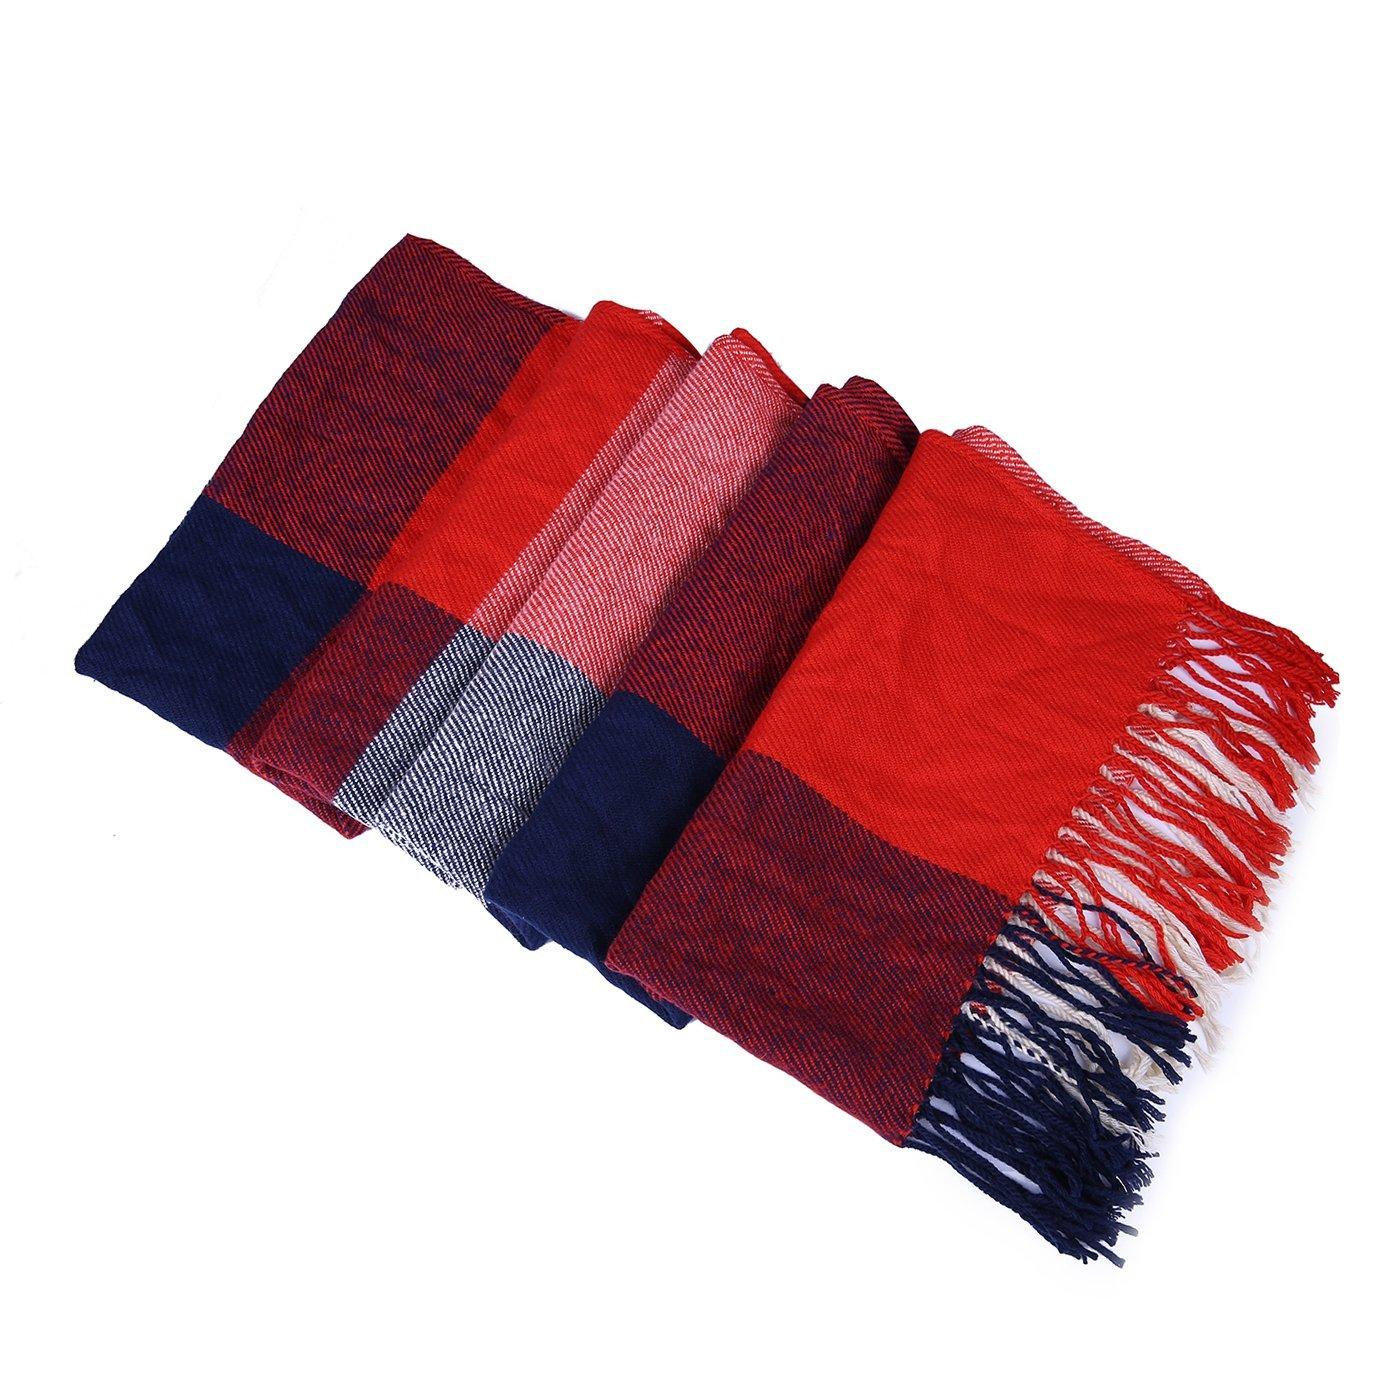 HDE Plaid Throw Ultra Soft Warm Winter Cabin Home Decorative Flannel Throw Blanket